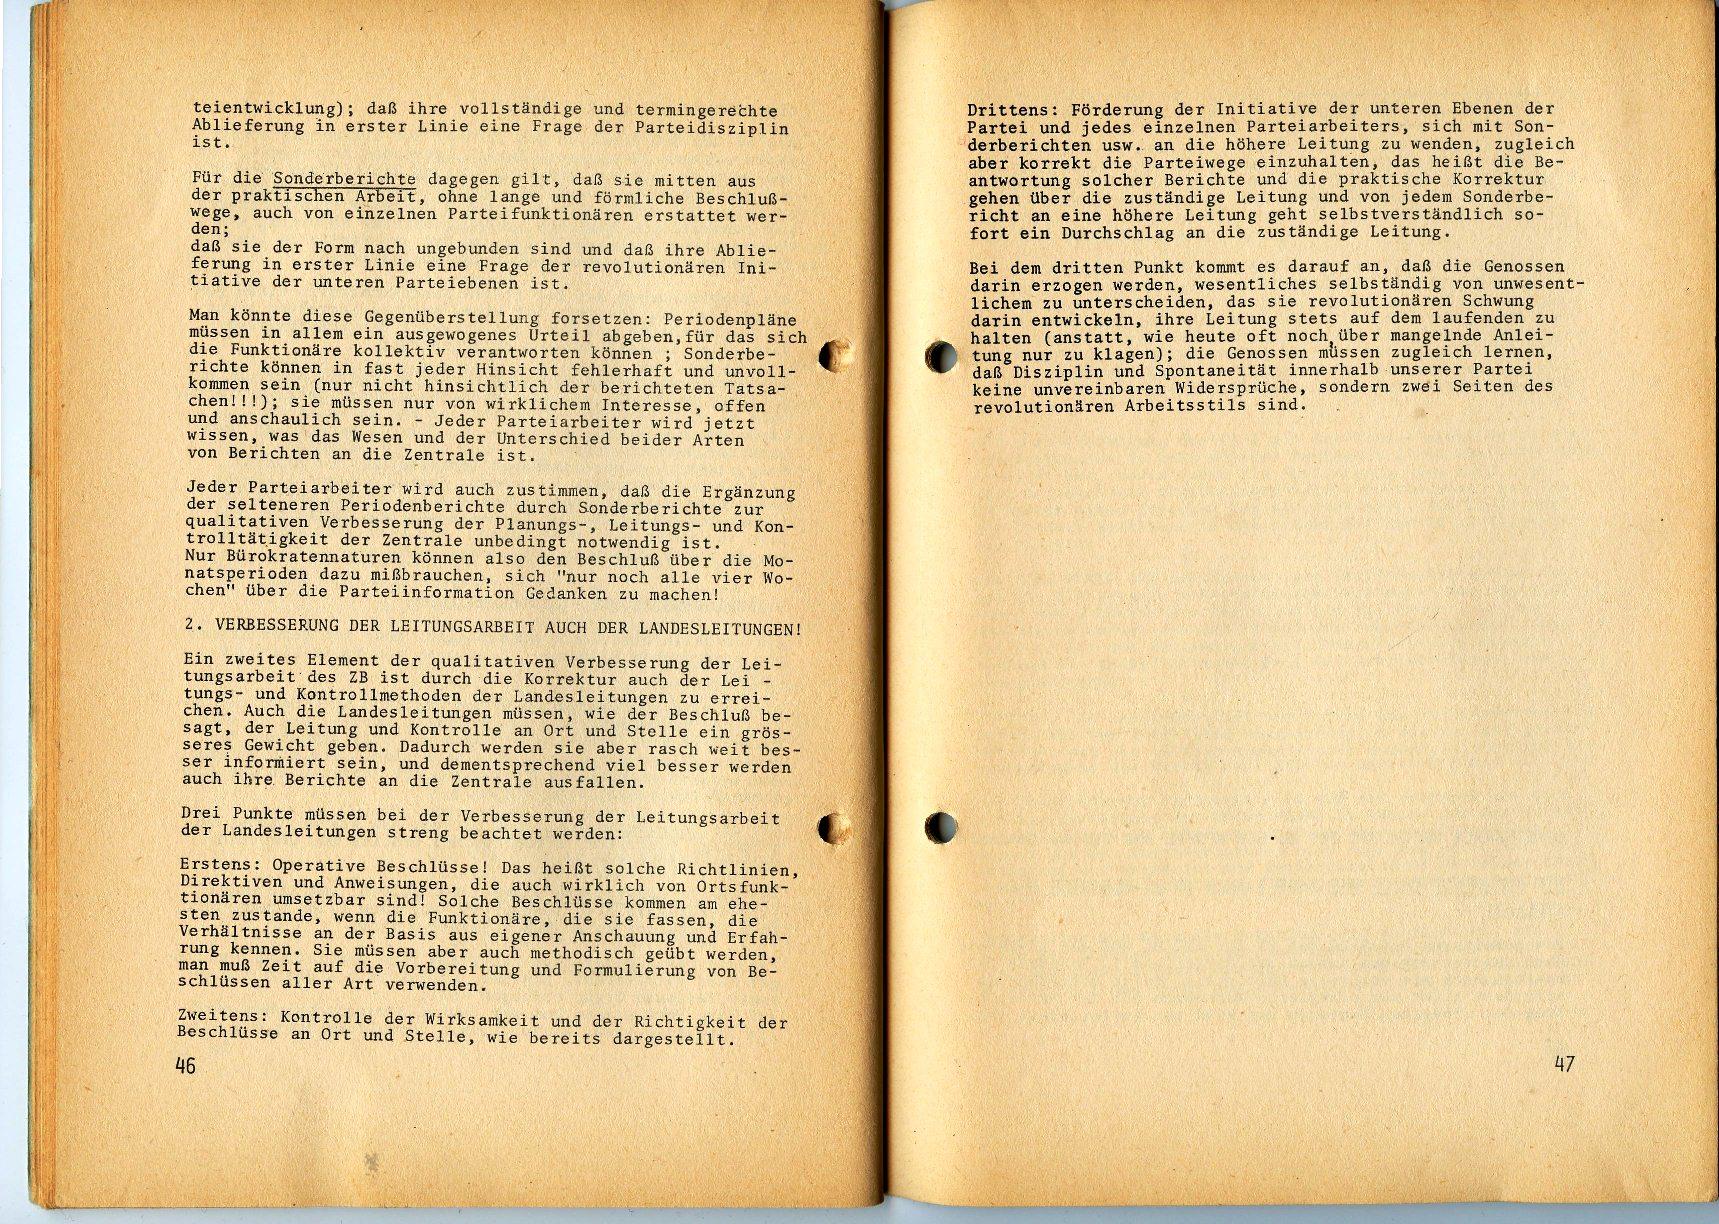 ZB_Parteiarbeiter_1971_04_24